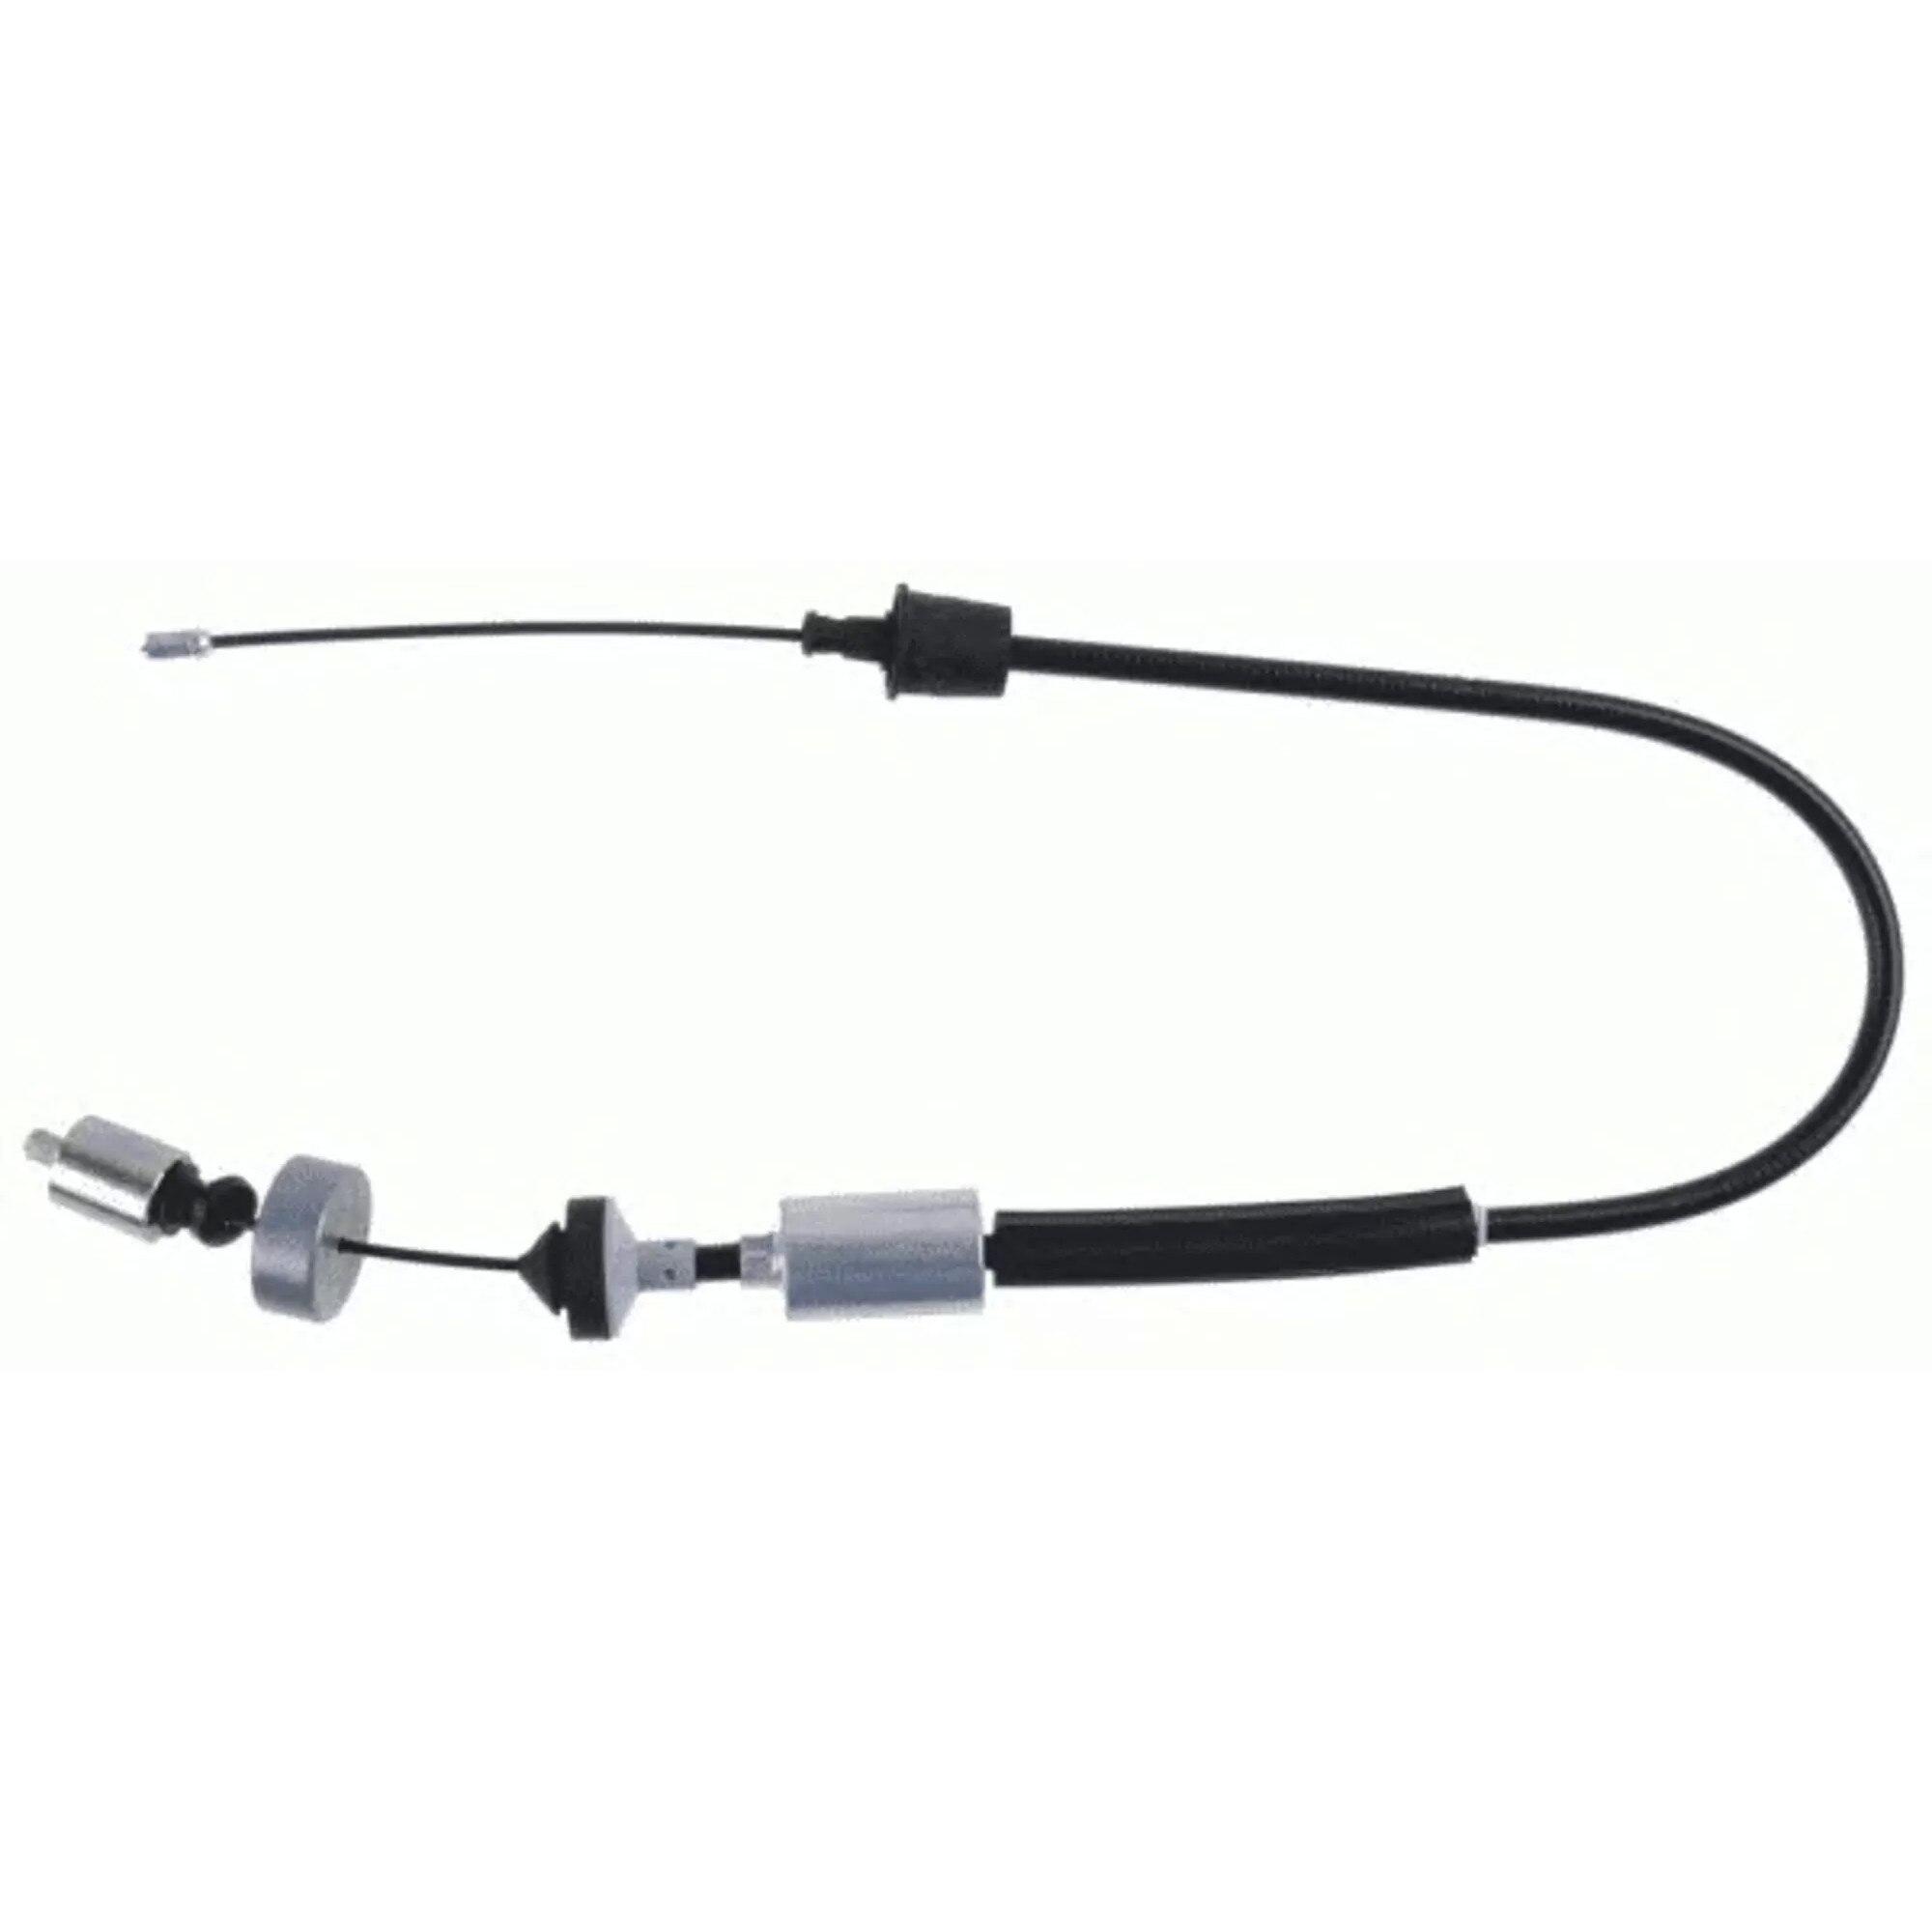 Cablu ambreiaj pentru renault trafic